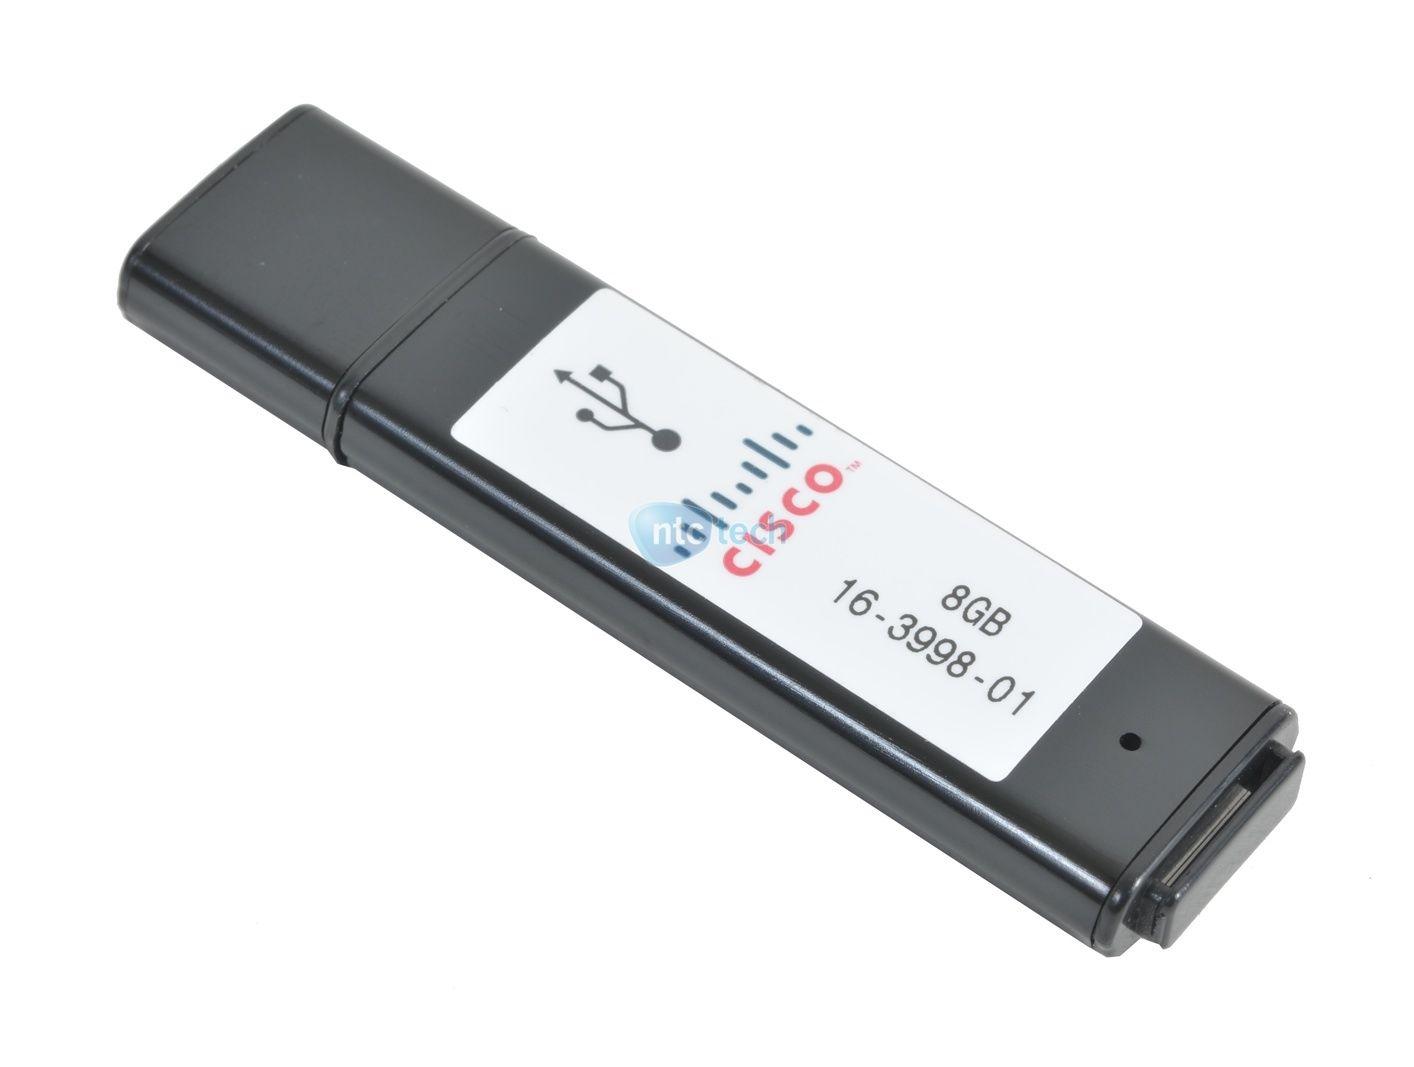 cisco 8gb usb memory stick 16 3998 01 cisco support. Black Bedroom Furniture Sets. Home Design Ideas